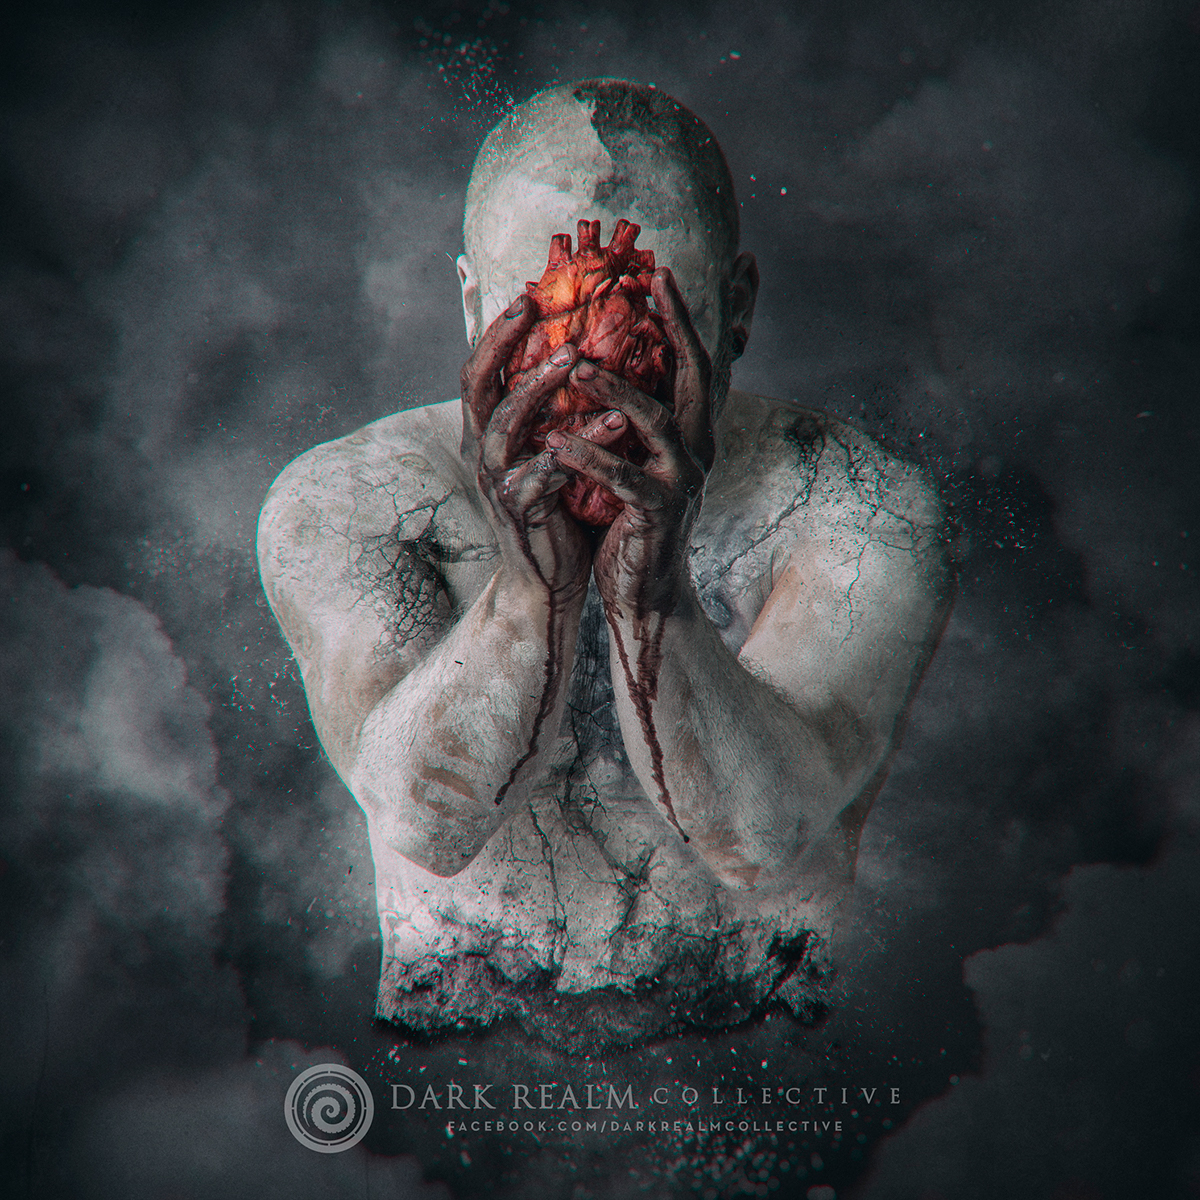 dark realm collective Dark Hearts dark surreal cybe fantasy